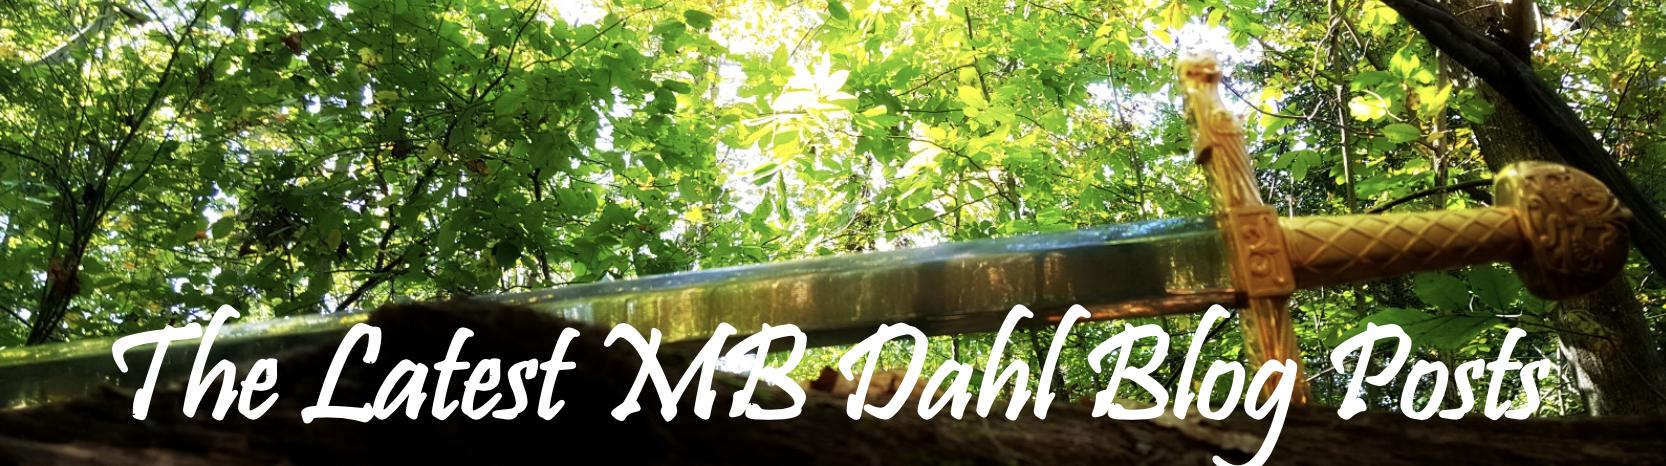 MB Dahl, Warrior, Blog Posts, Short Story,. Fiction